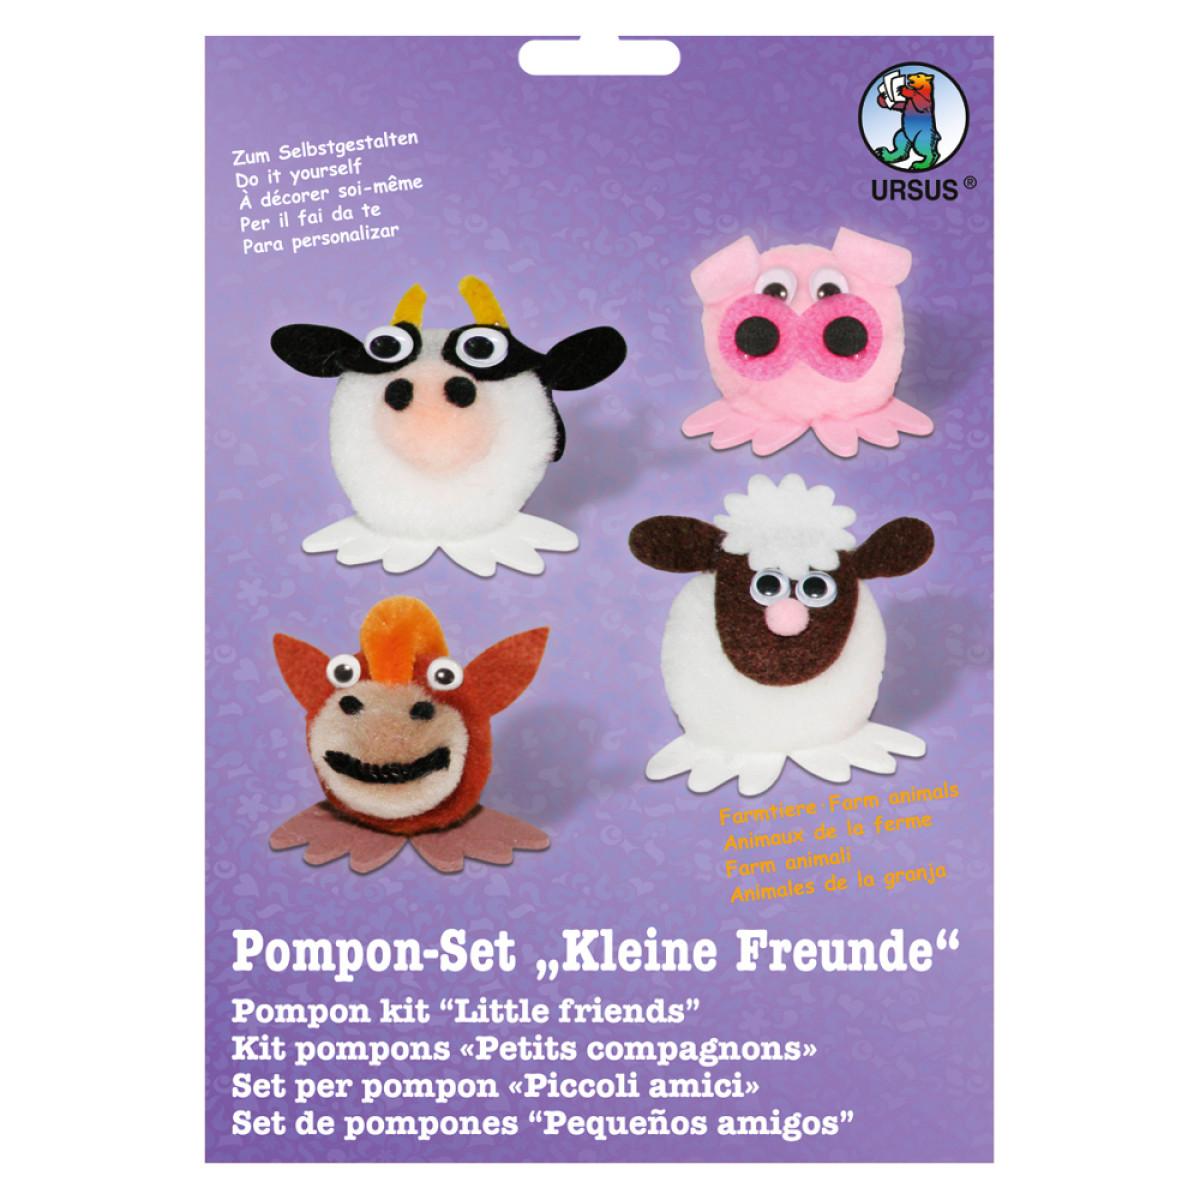 "Pompon-Set ""Kleine Freunde"" Farmtiere"